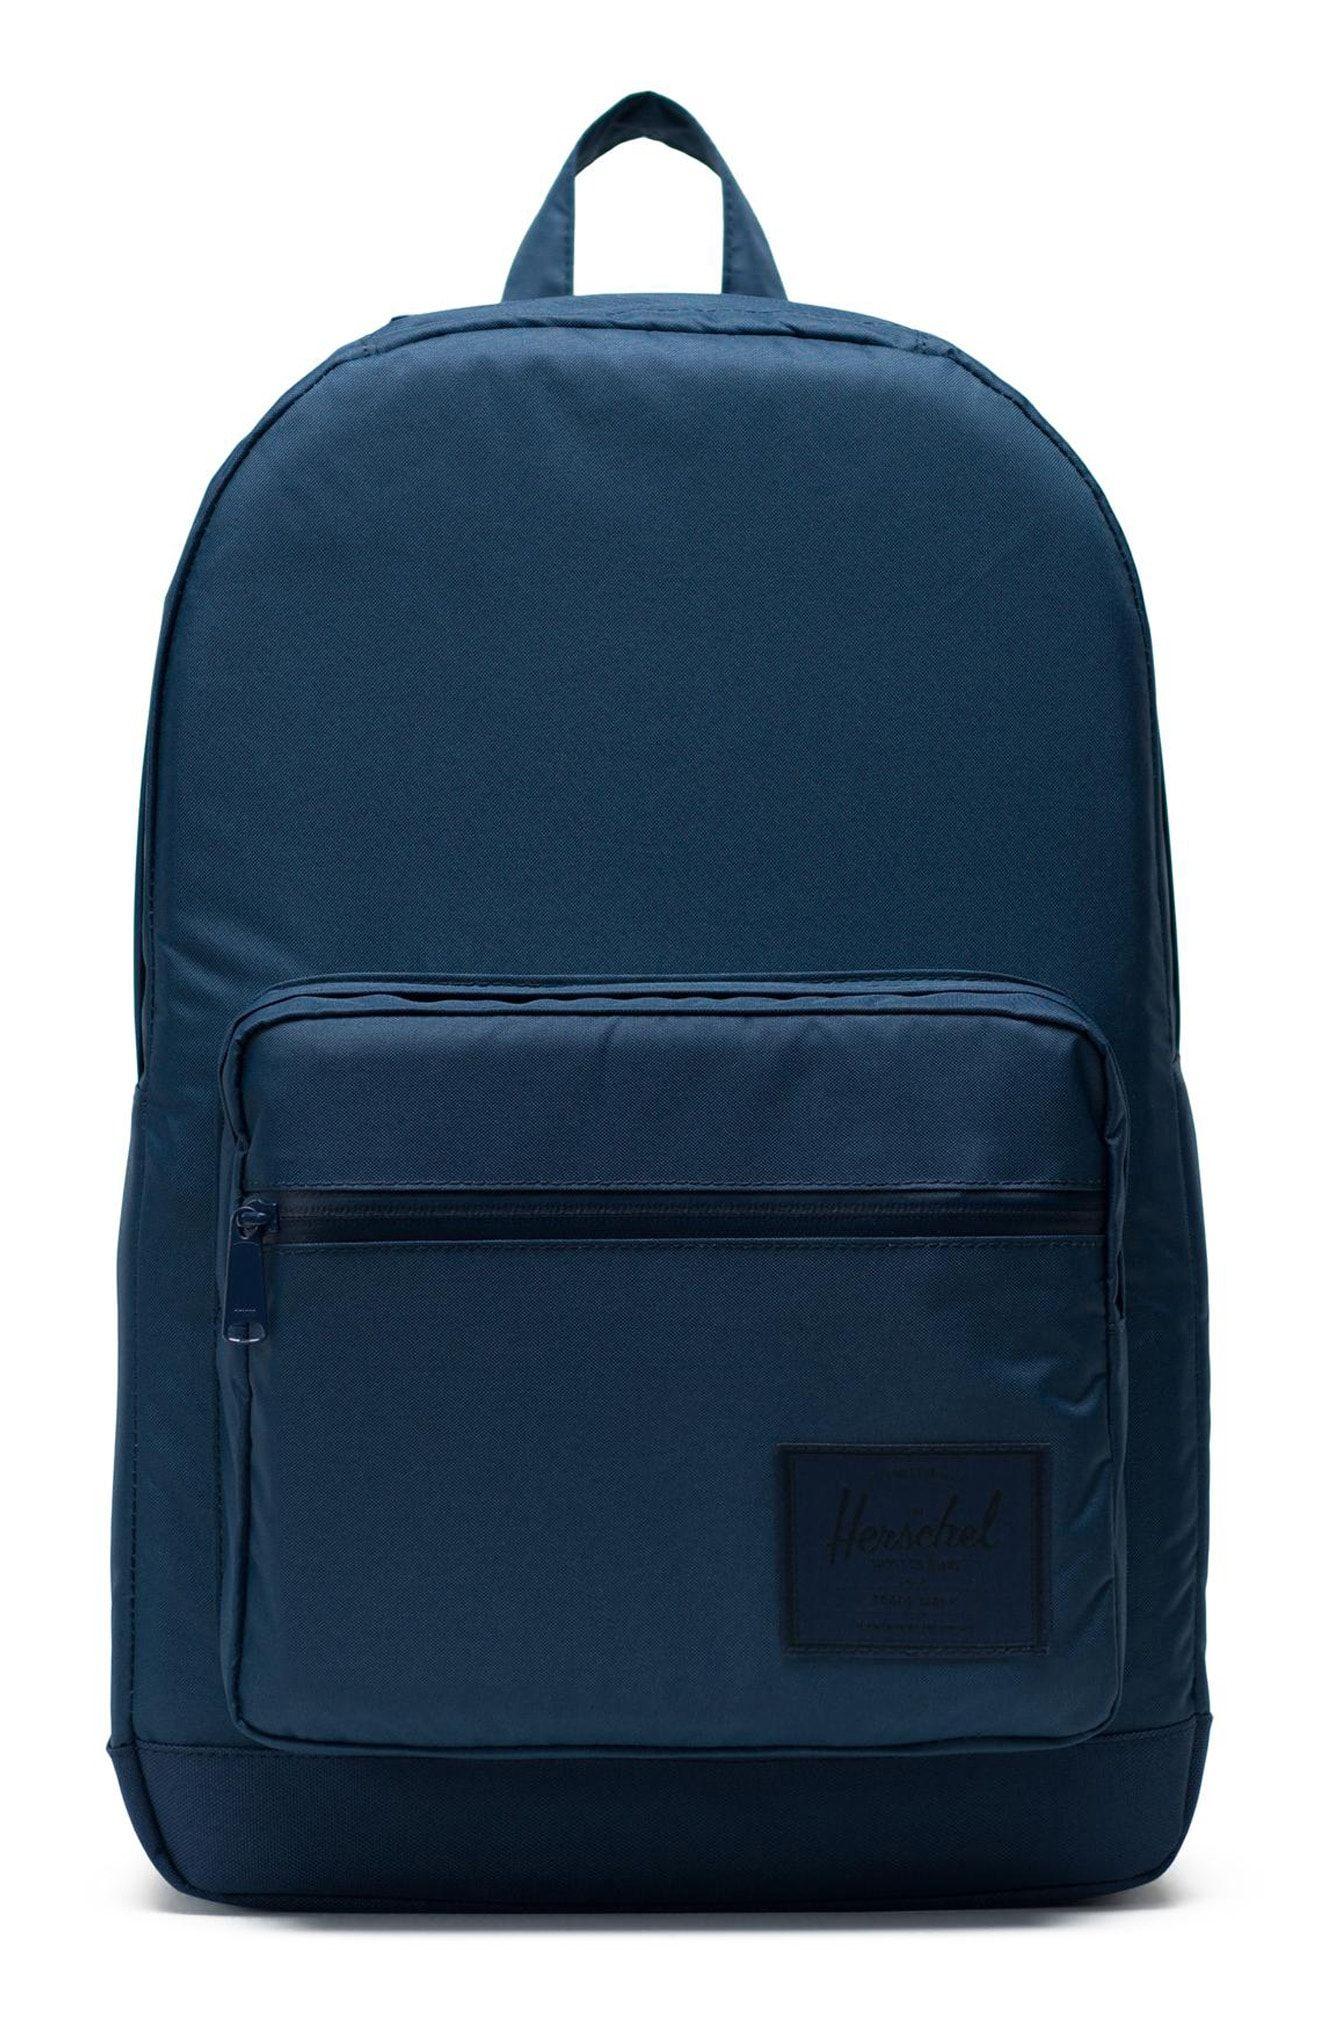 d4cfff9d97b HERSCHEL SUPPLY CO. POP QUIZ LIGHT BACKPACK - BLUE.  herschelsupplyco.  bags   backpacks